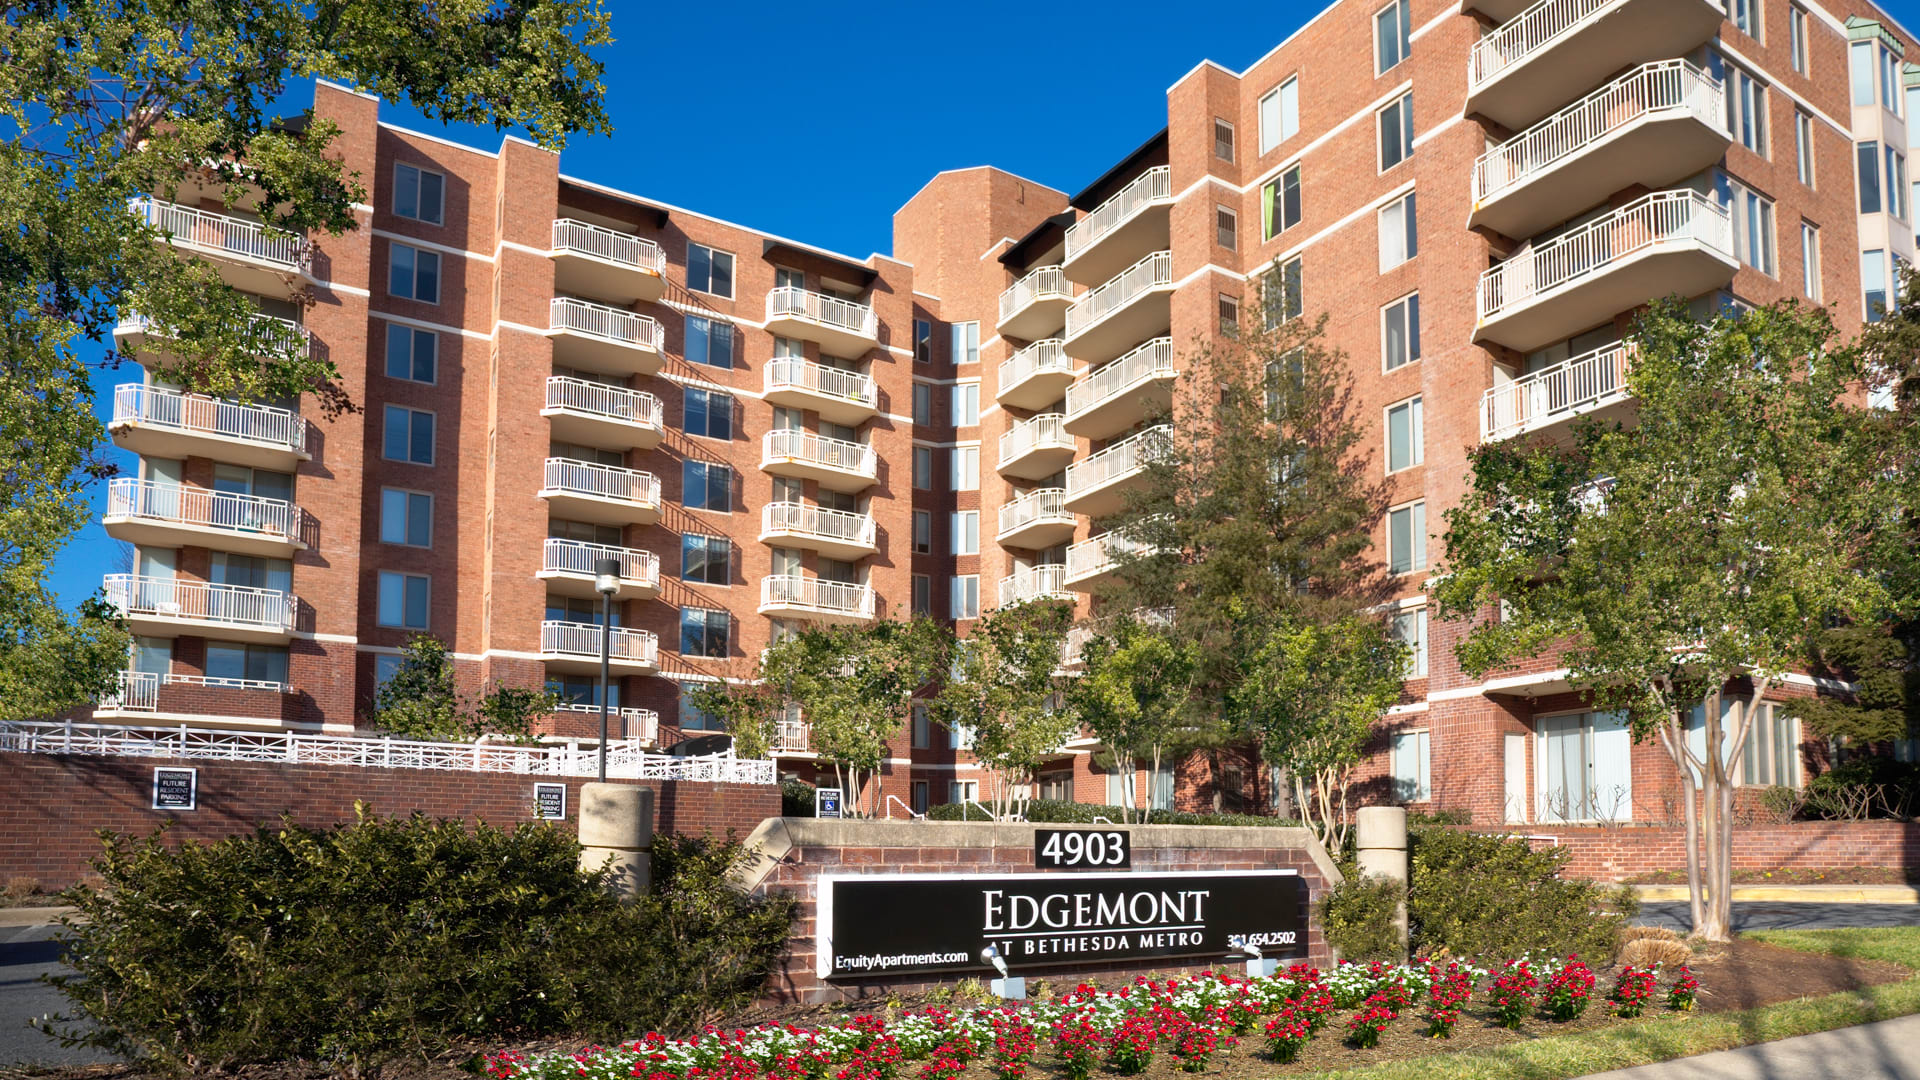 Edgemont at Bethesda Metro Apartments - Building